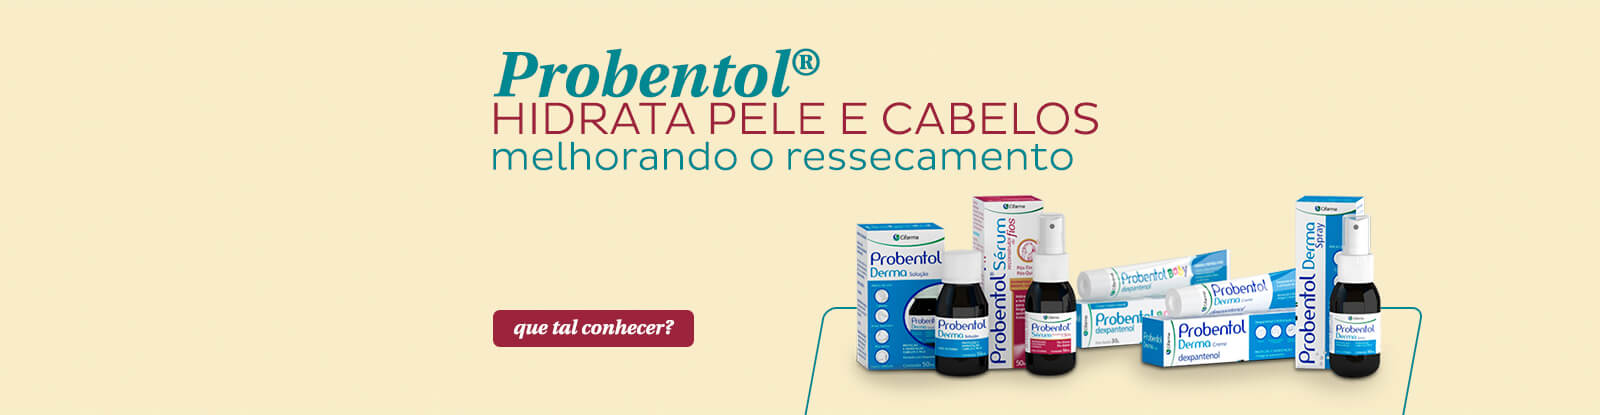 Probentol